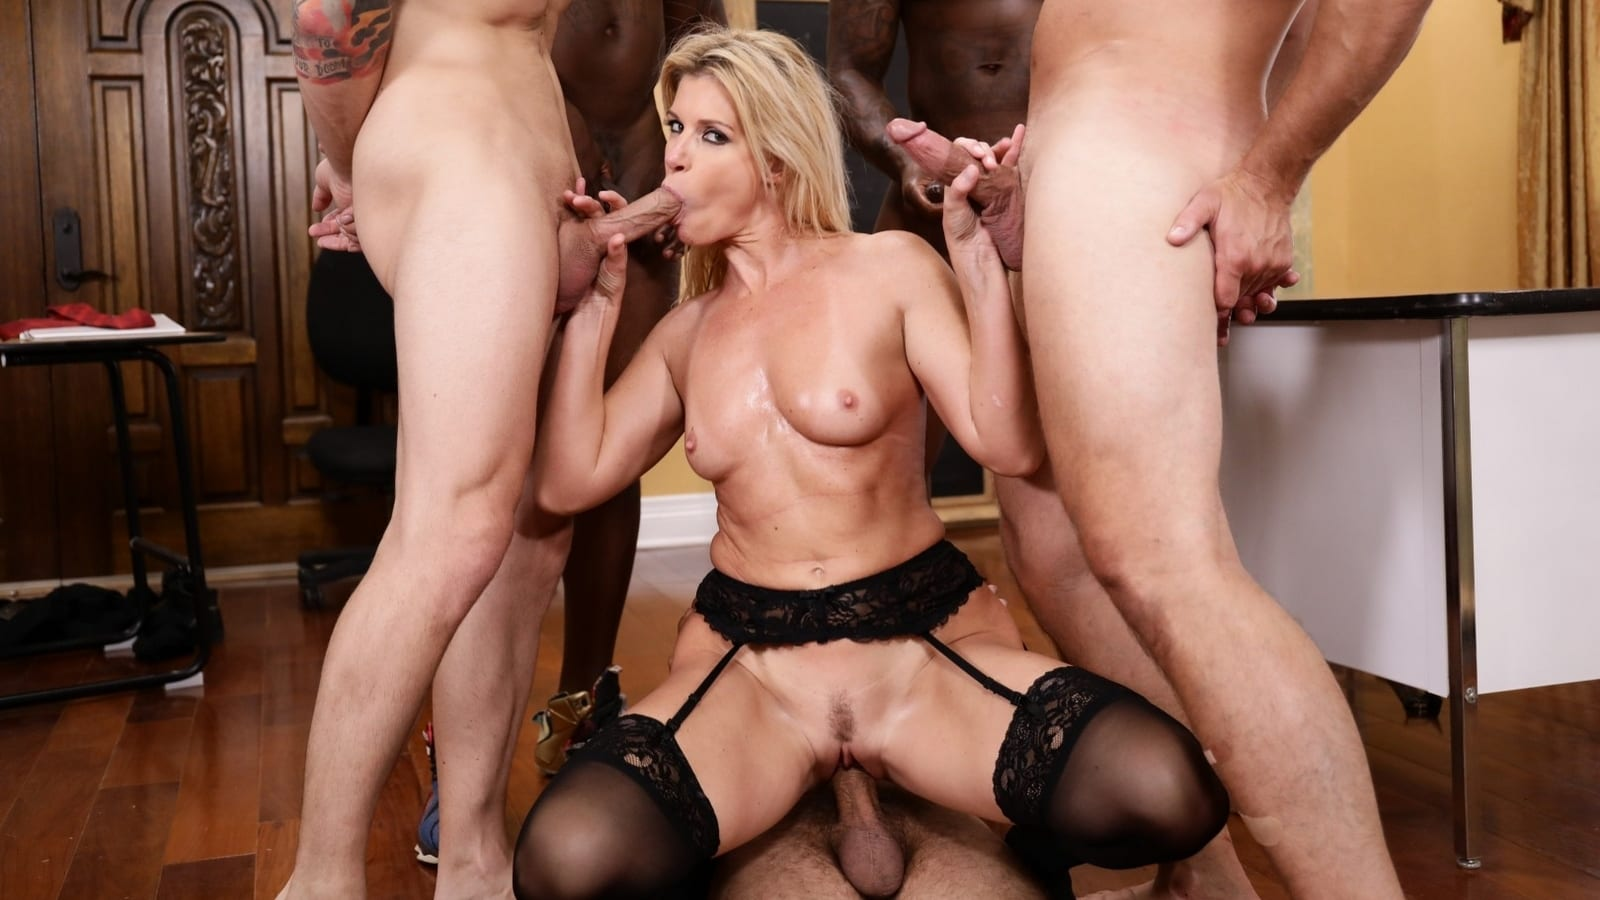 teachet-gang-bang-nude-florida-interracial-sex